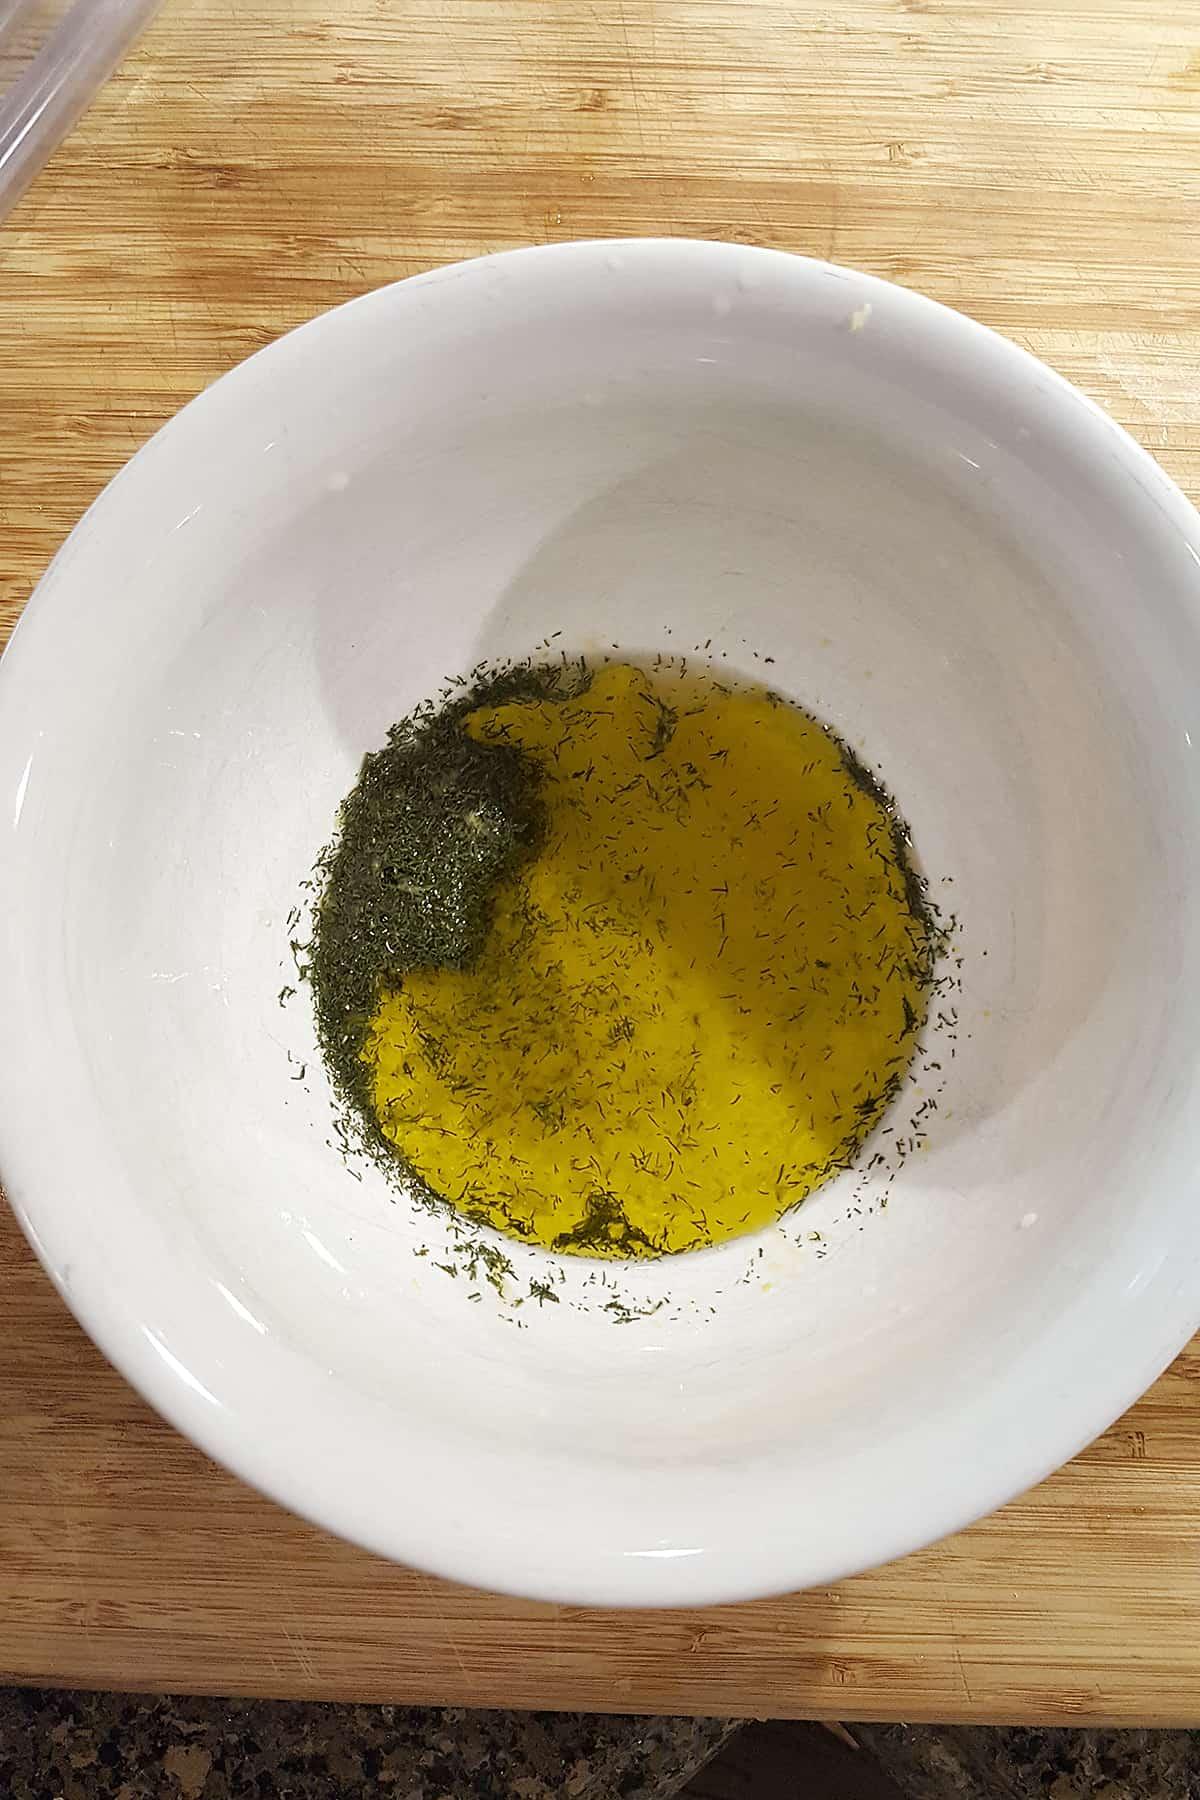 Mixing the dressing for Lemon Dill Potato Salad